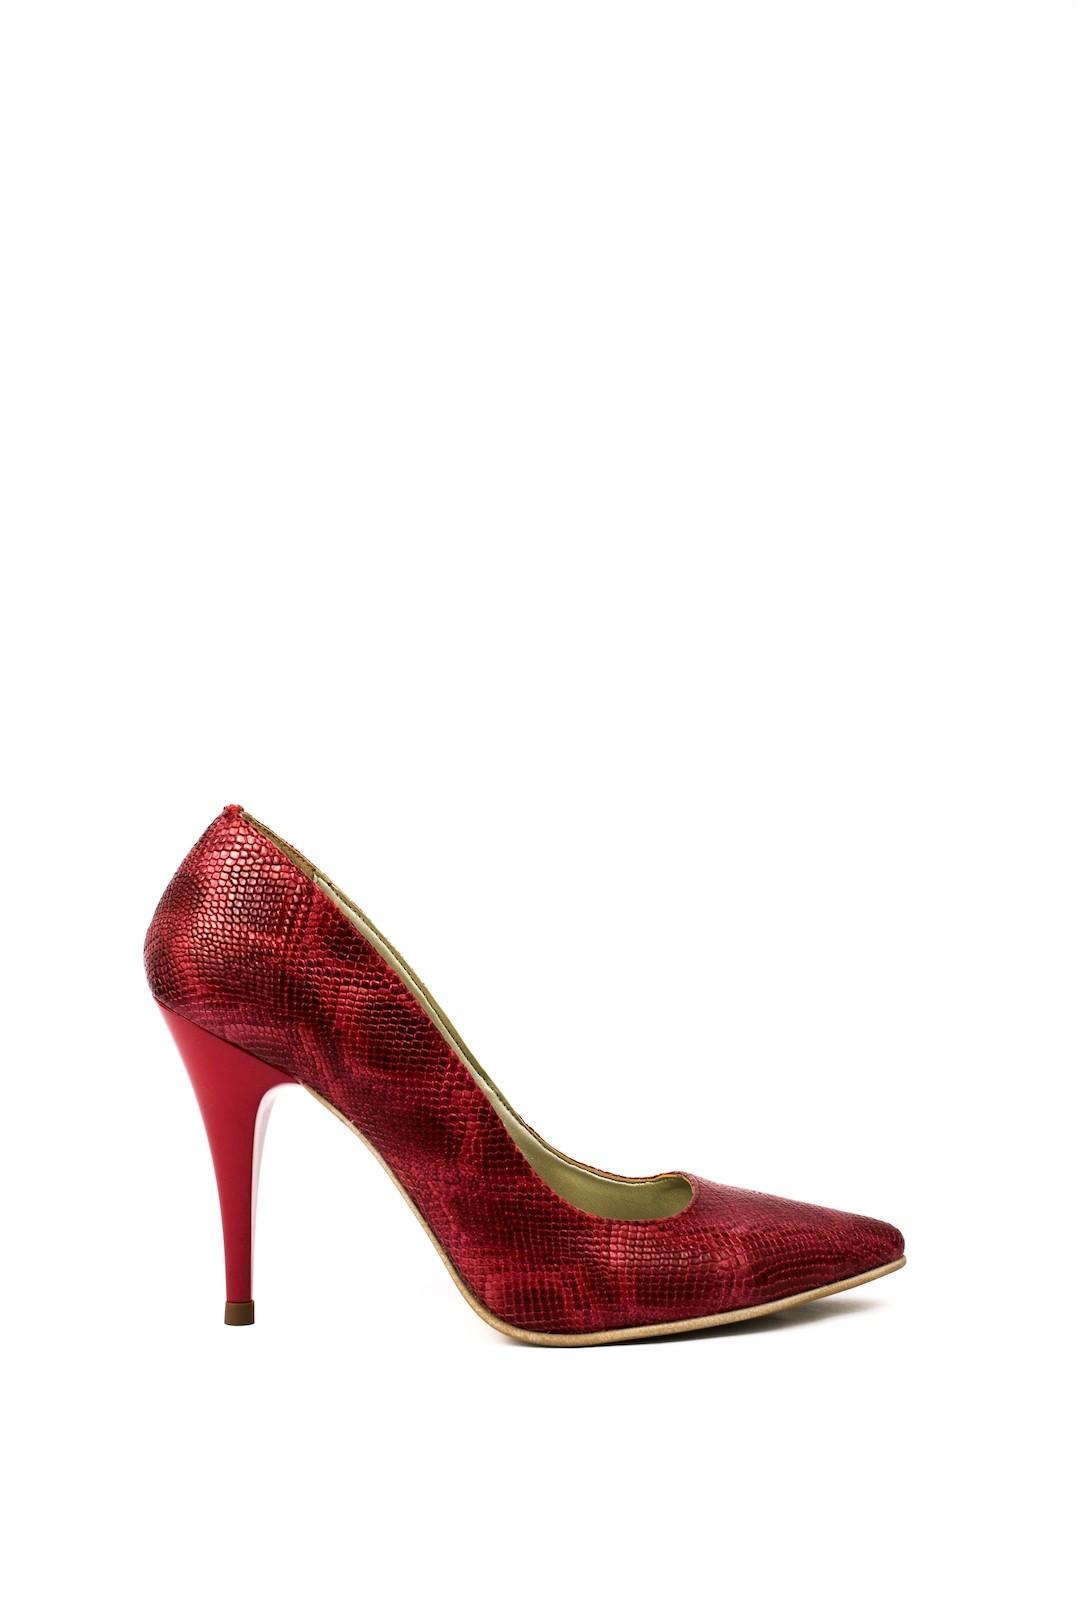 Pantofi Dama piele naturala rosu Rada